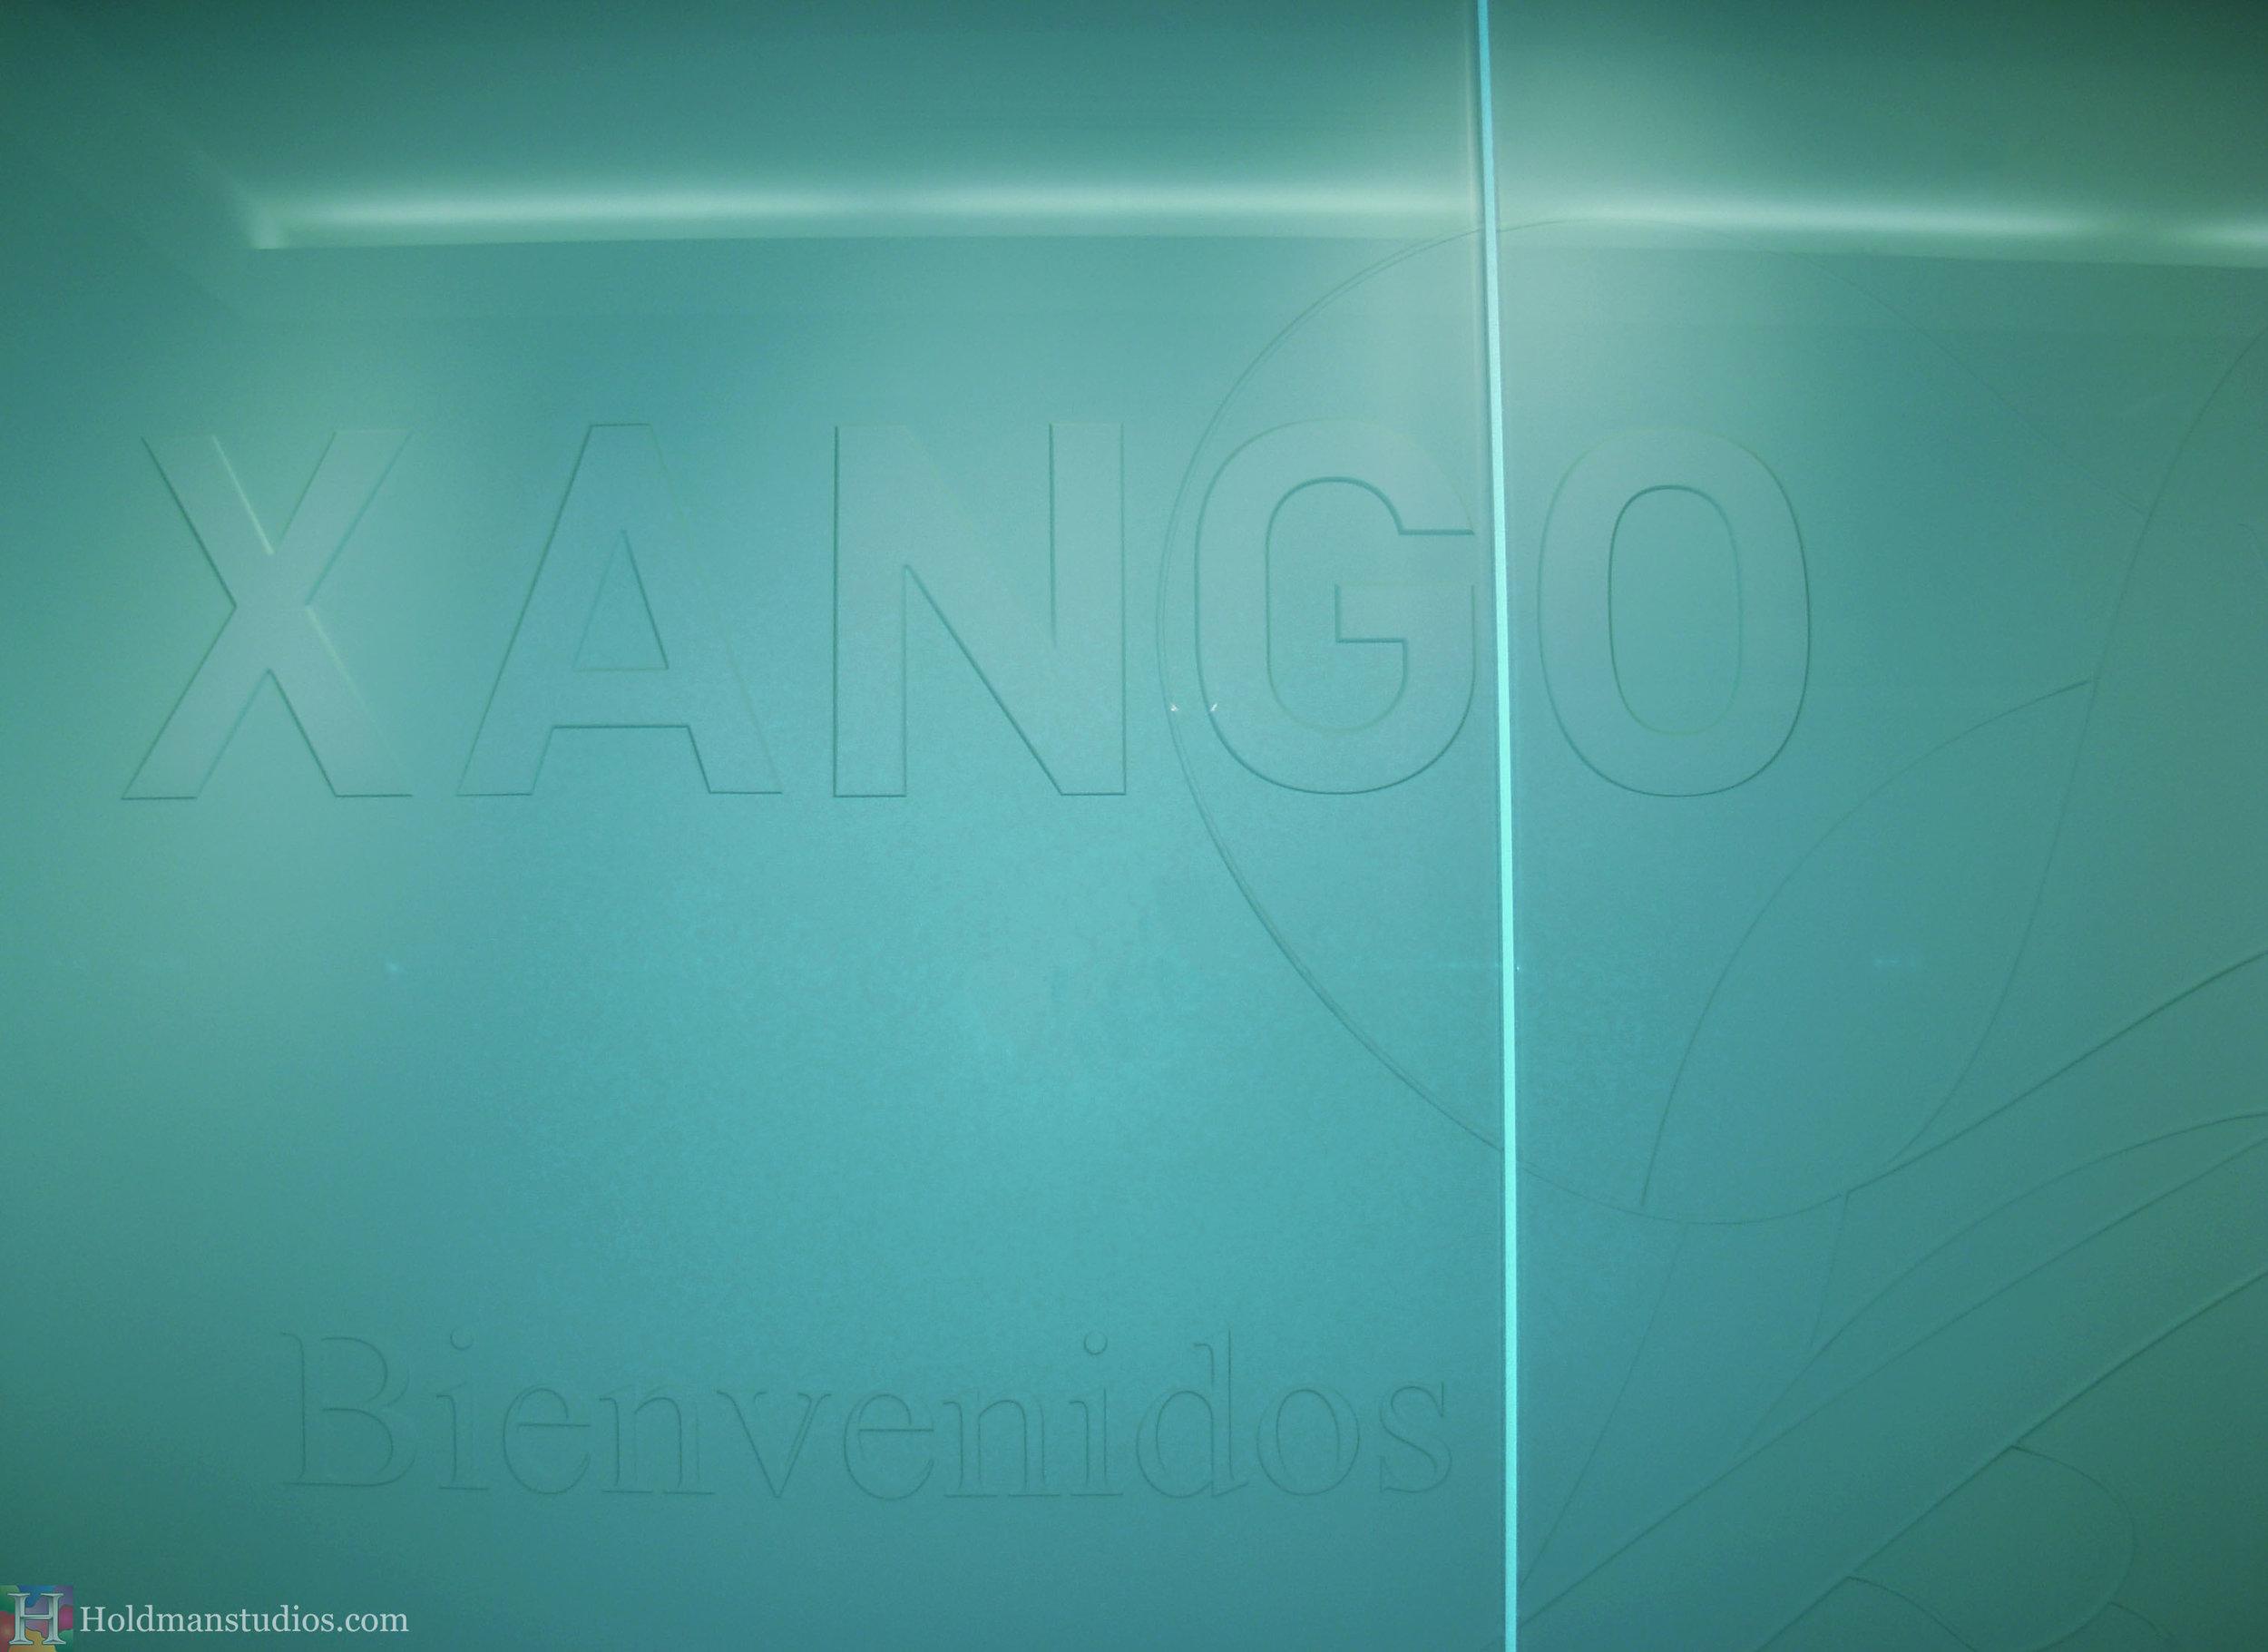 Holdman-studios-etched-art-glass-Xango-wall-crop.jpg